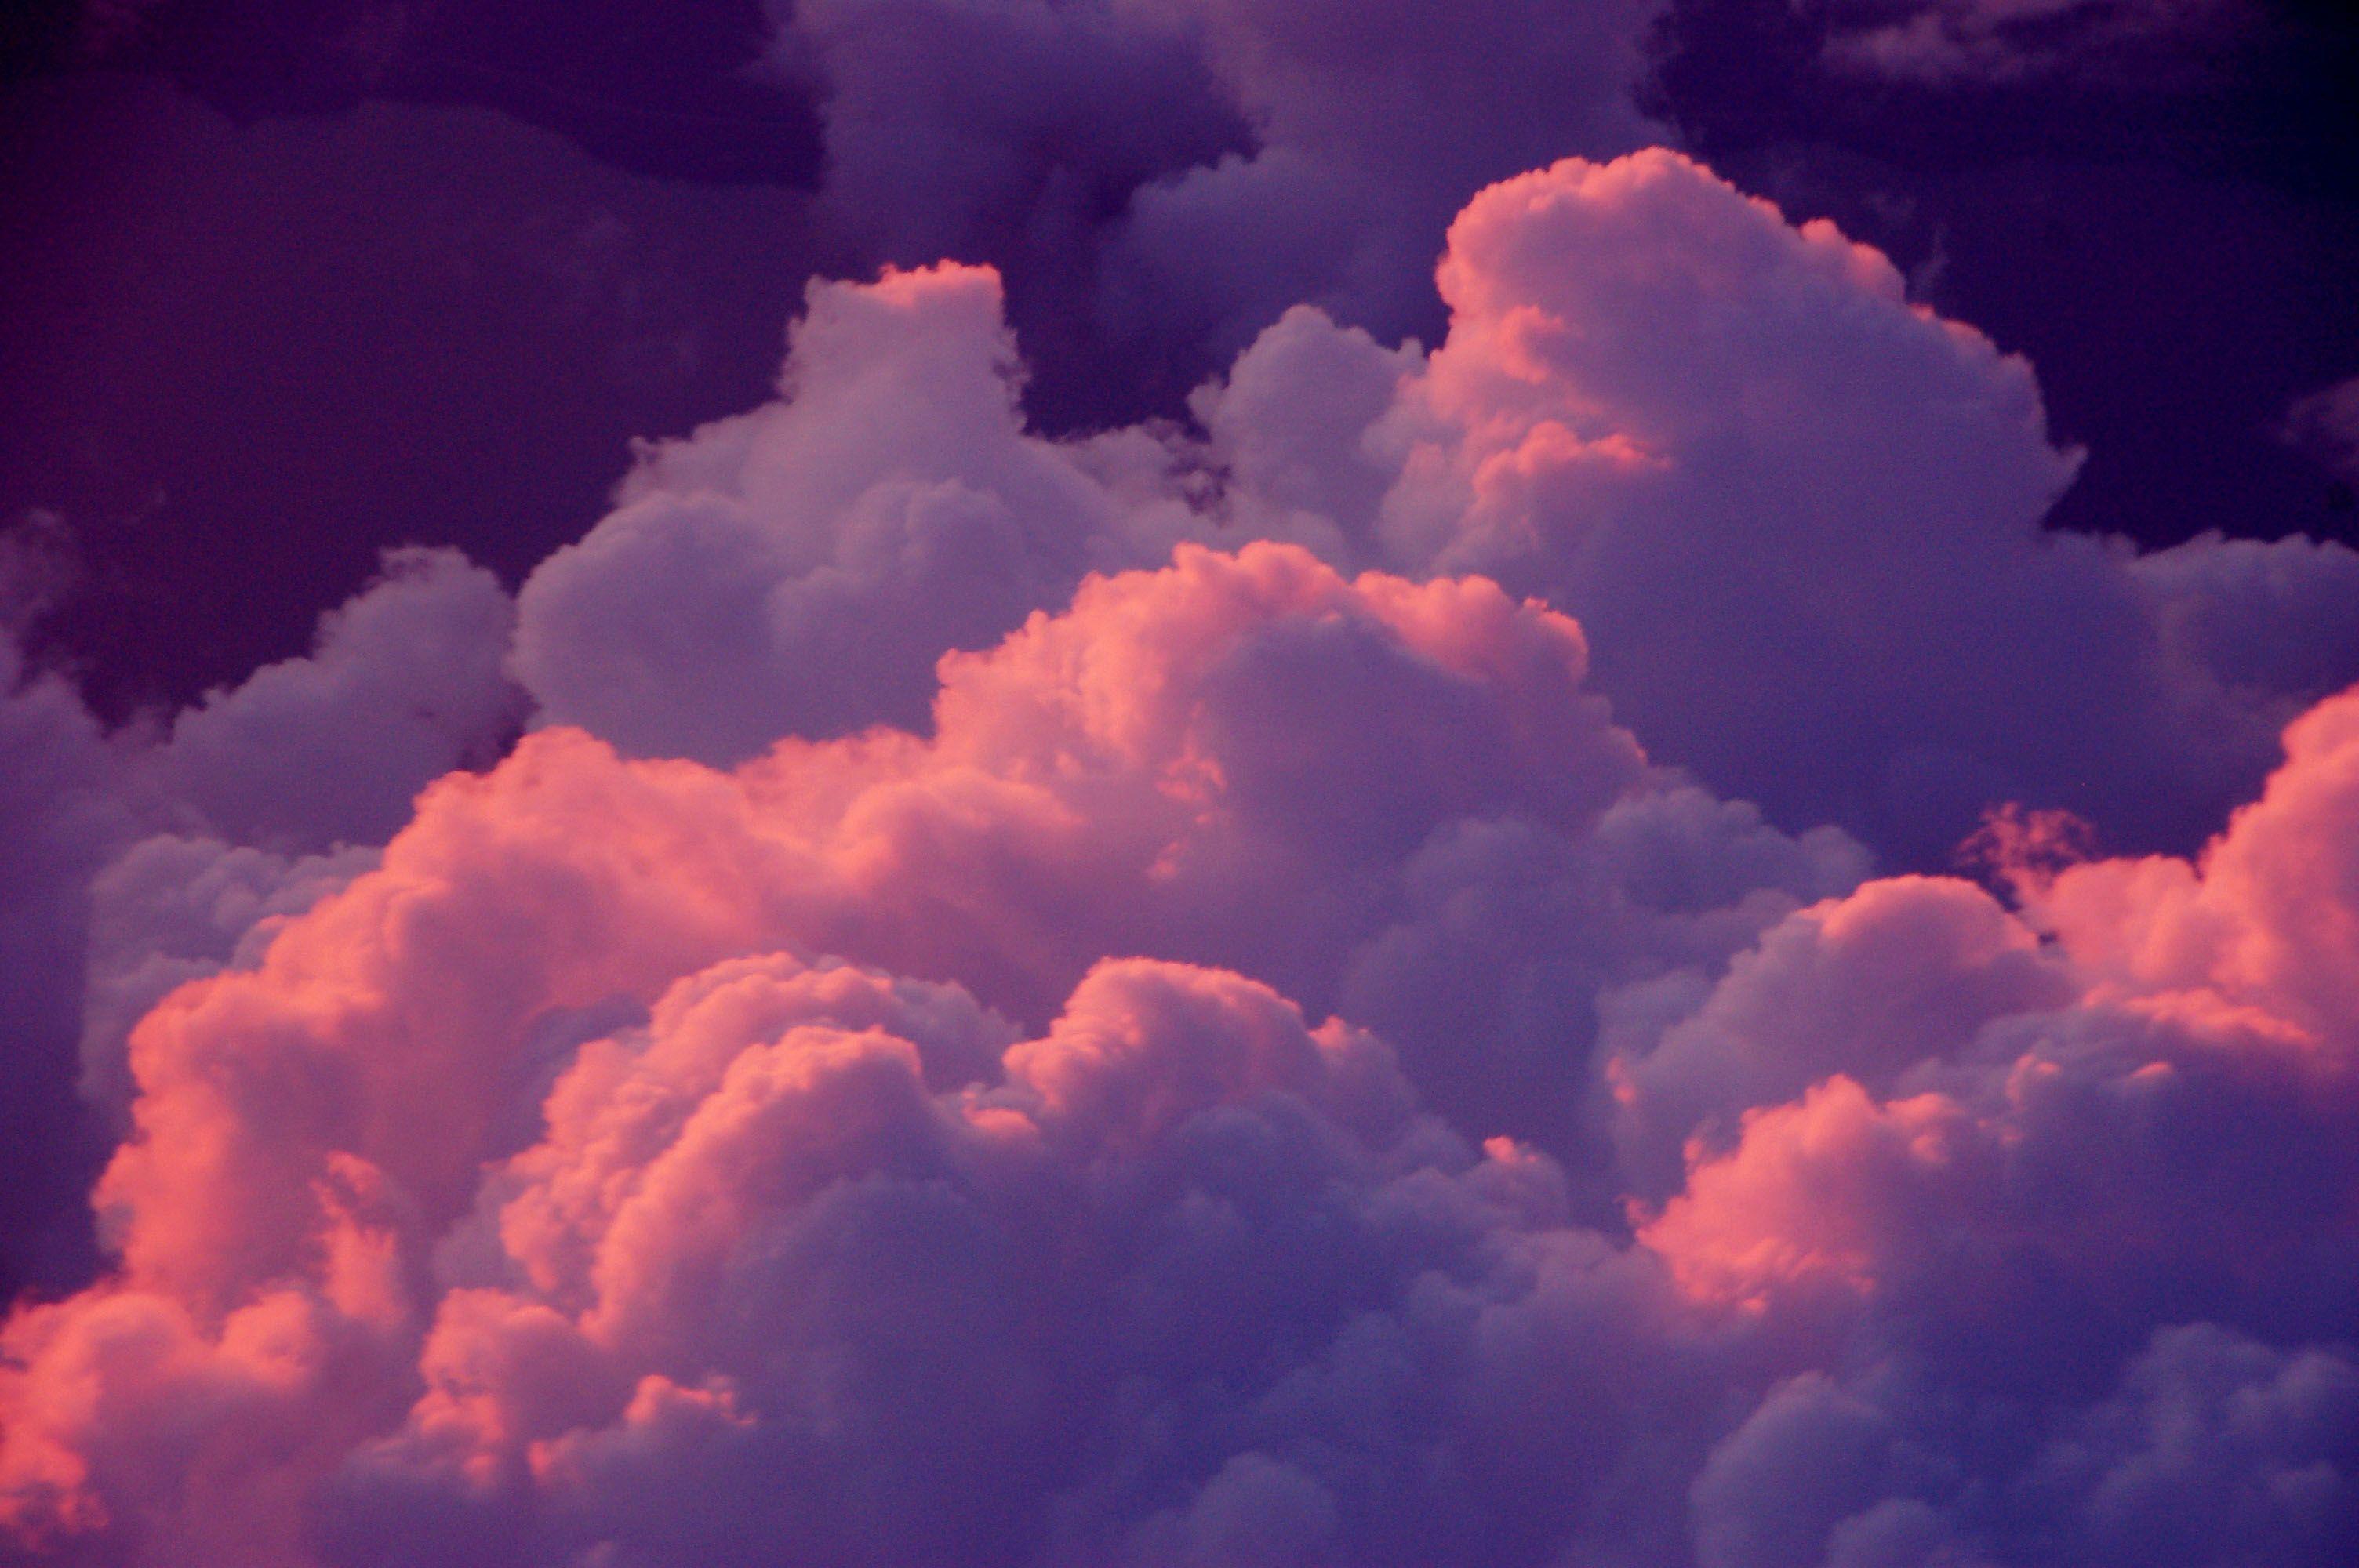 Purple Cloud Background Best Background Images Hd Wallpaper Pink Clouds Wallpaper Pink Clouds Clouds Aesthetic clouds desktop wallpaper hd